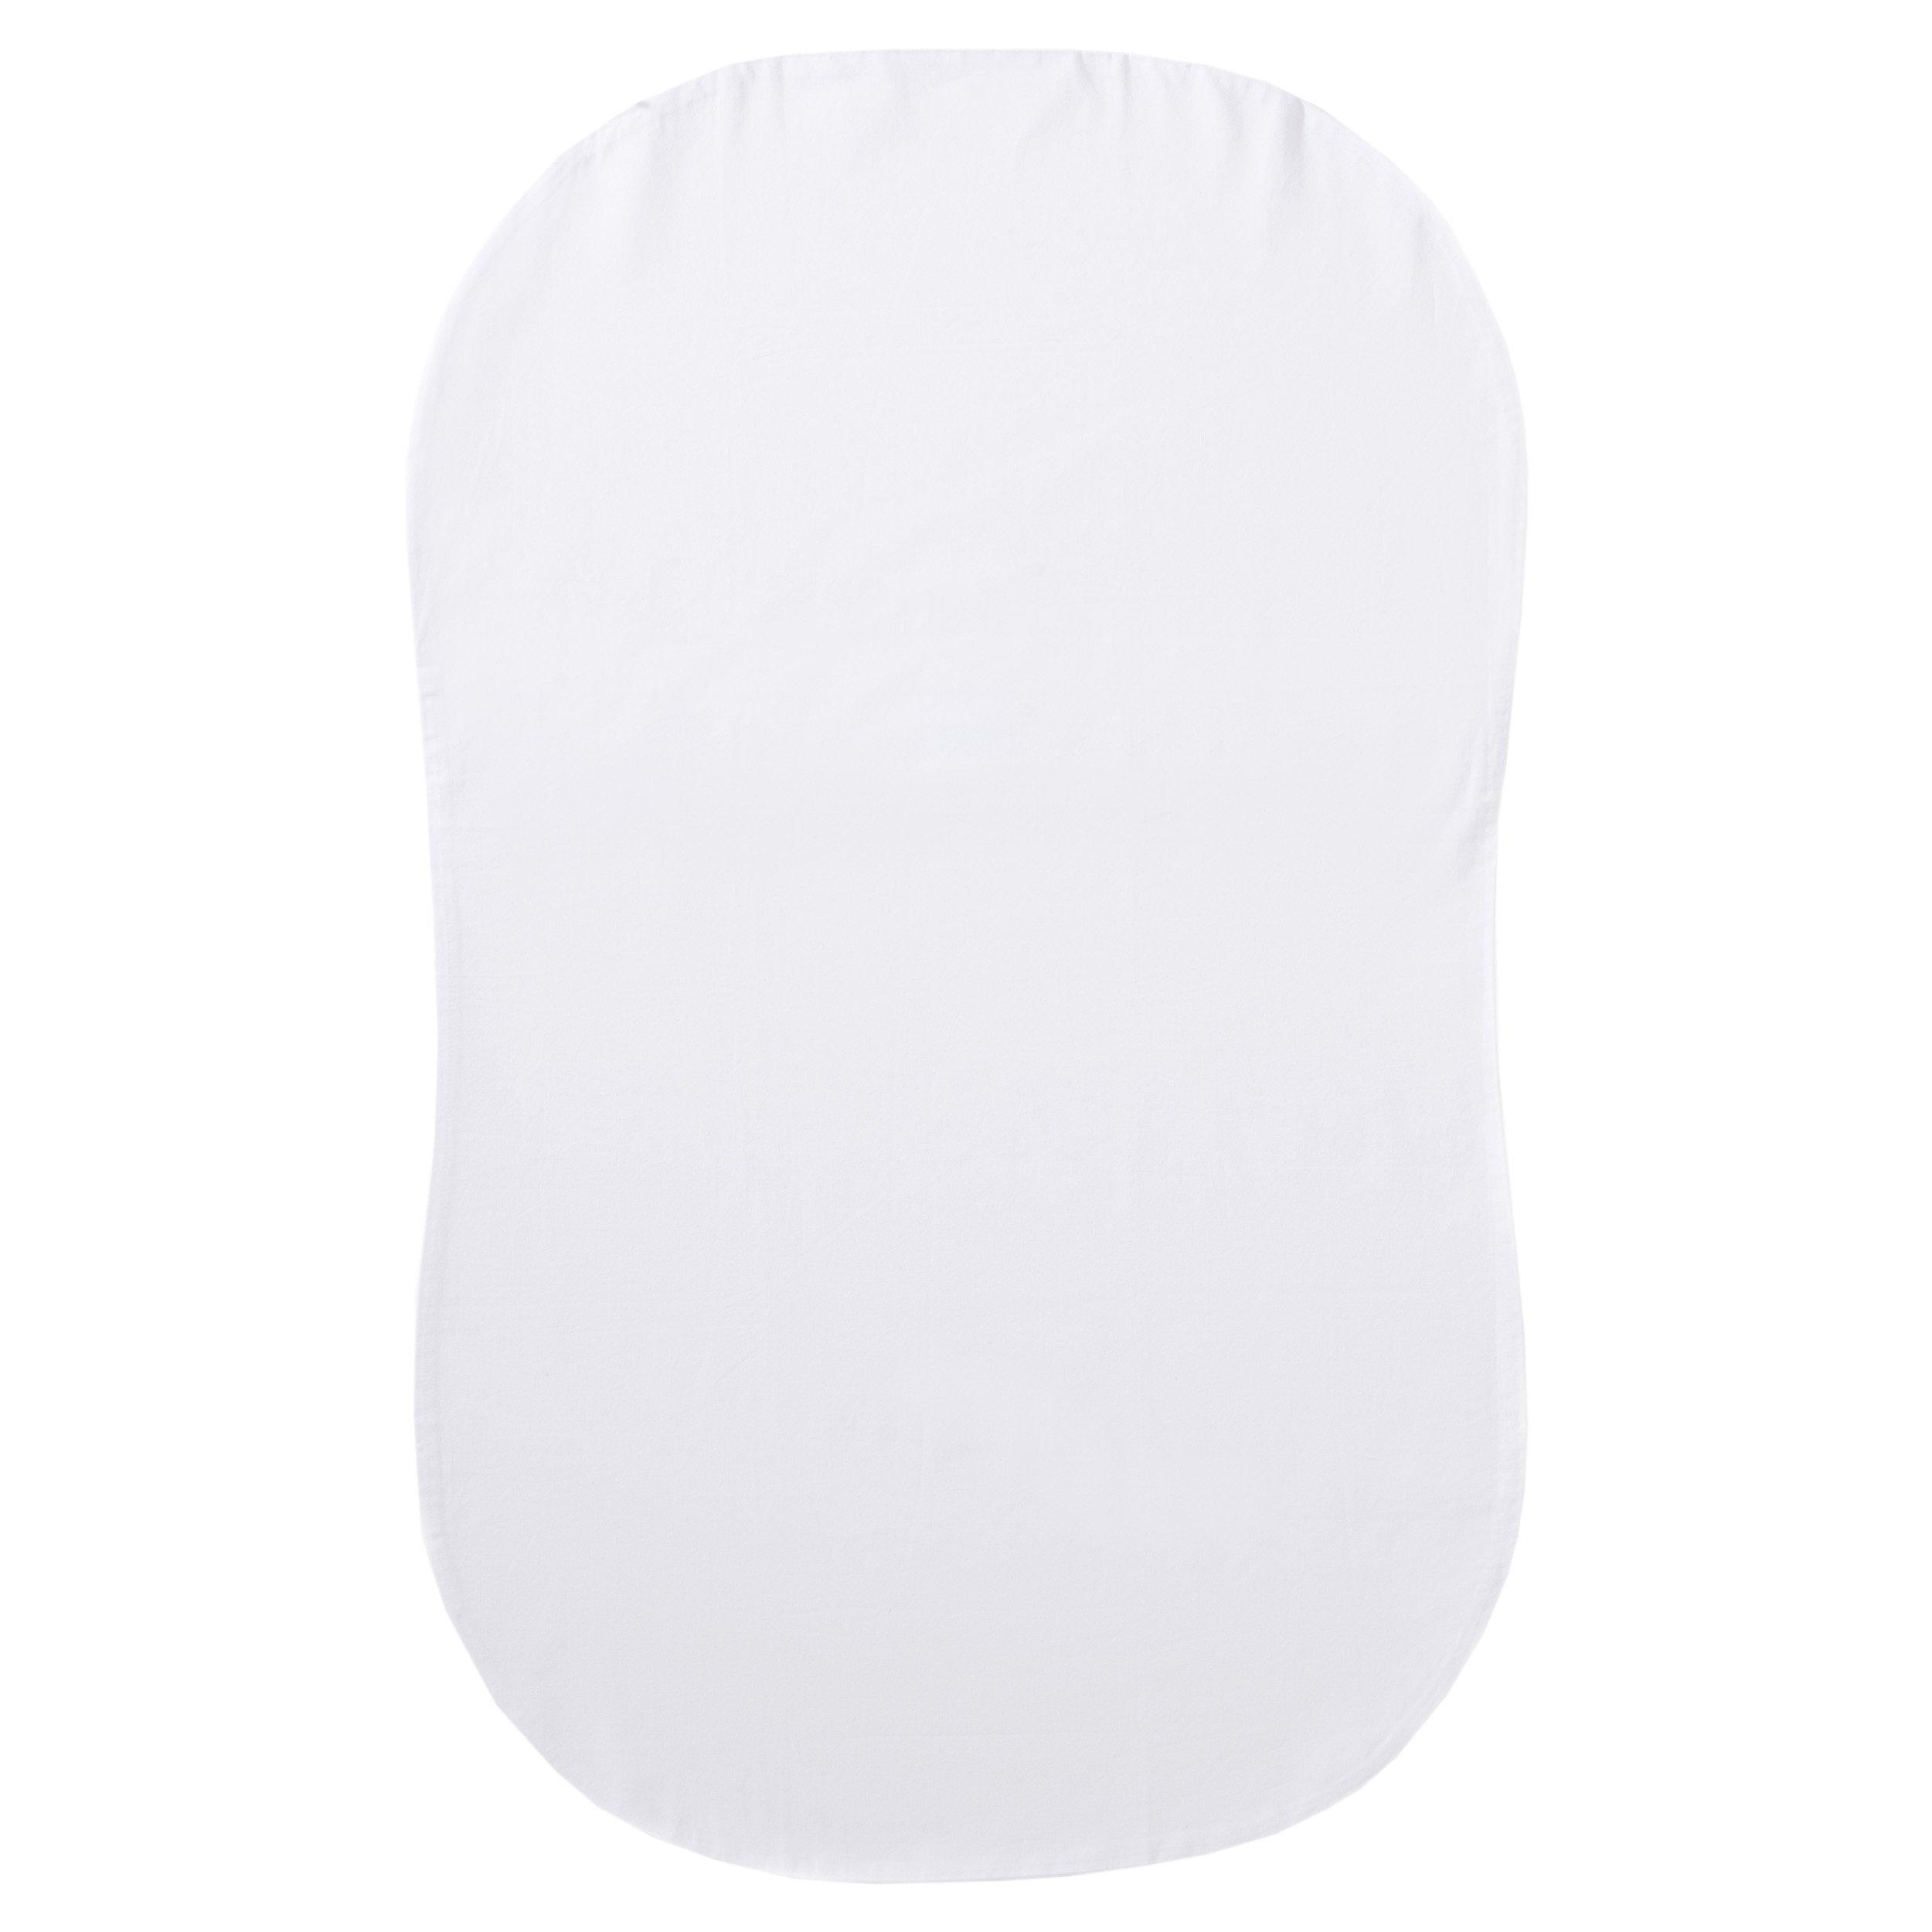 Halo Bassinest Swivel Sleeper Fitted Sheet 100% Organic Cotton, White